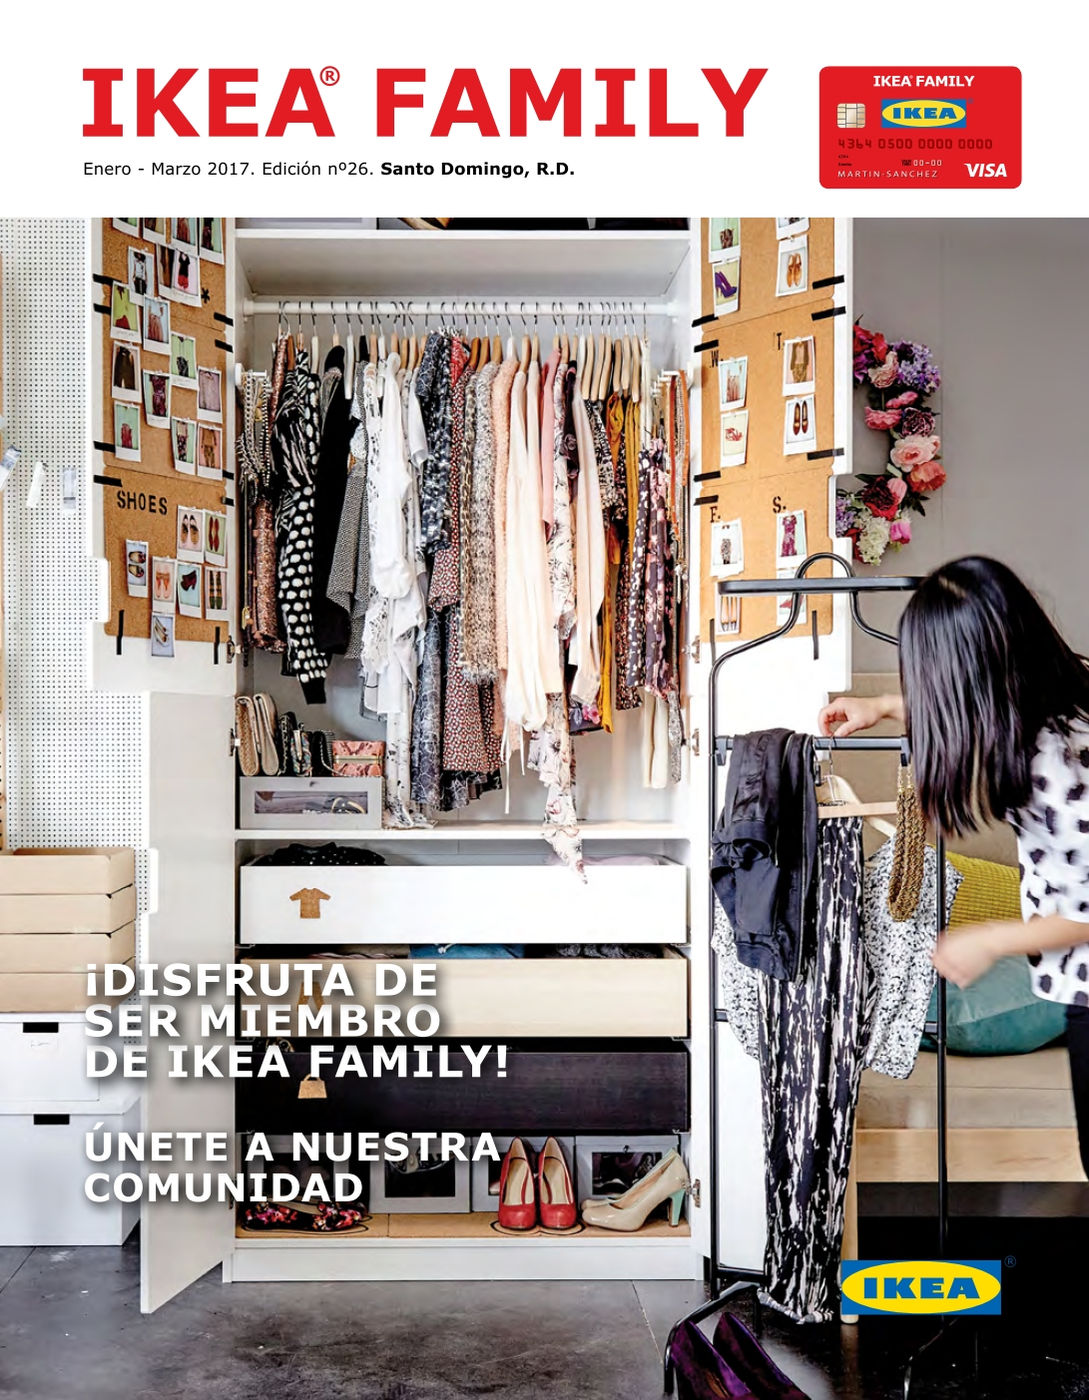 revista ikea family. Black Bedroom Furniture Sets. Home Design Ideas